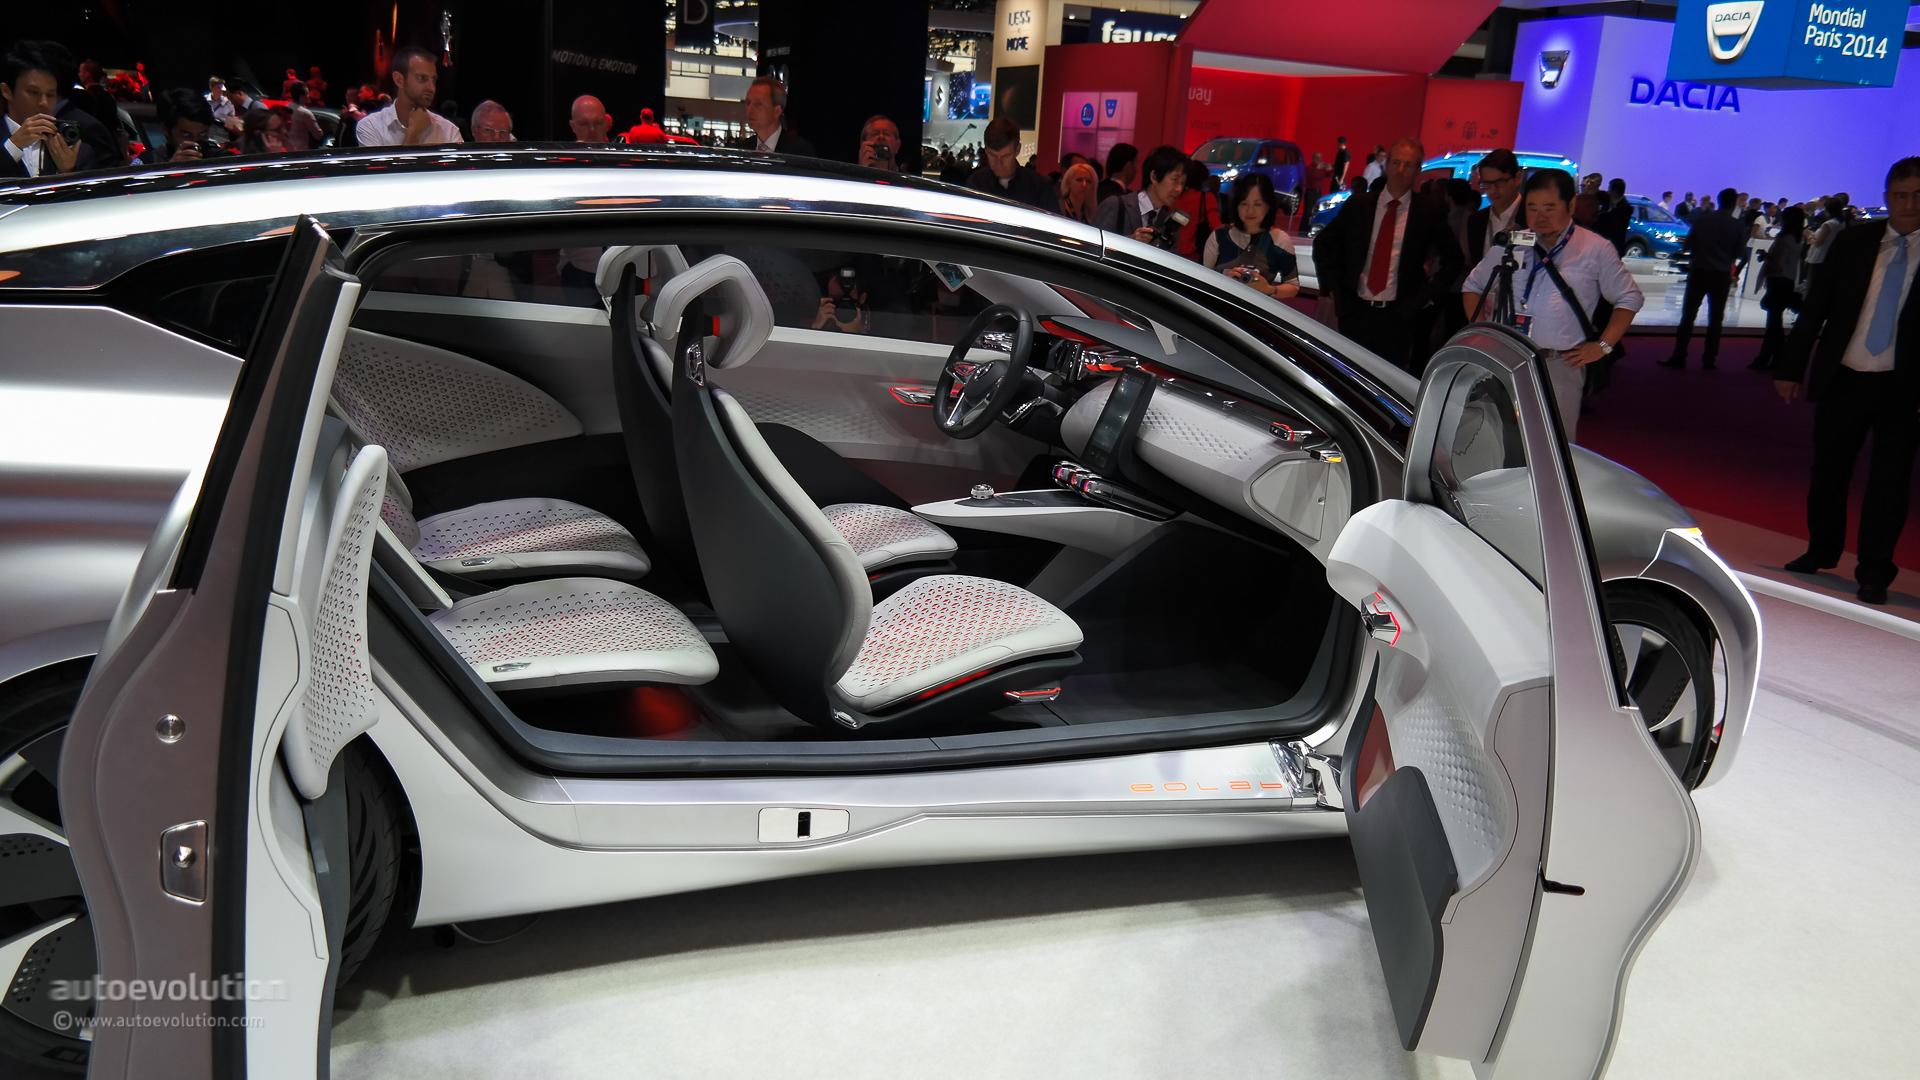 Renault Eolab Shows Us The Future At Paris Motor Show Live Photos on Hyundai Engine